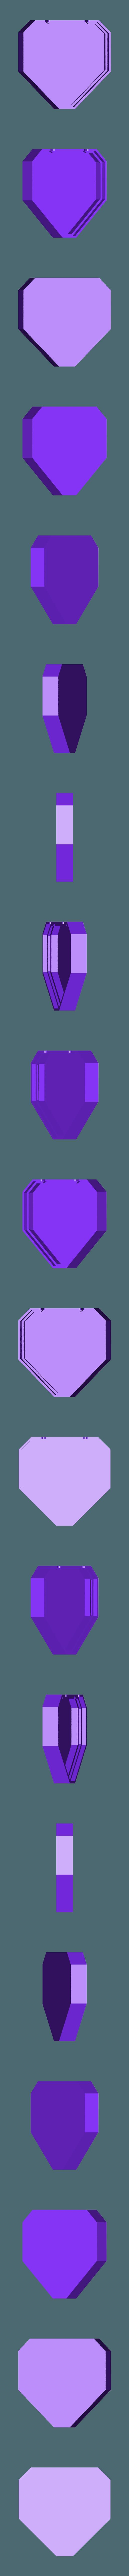 heart-case.stl Download free STL file NeoPixel LED Heart Necklace • 3D printable model, Adafruit